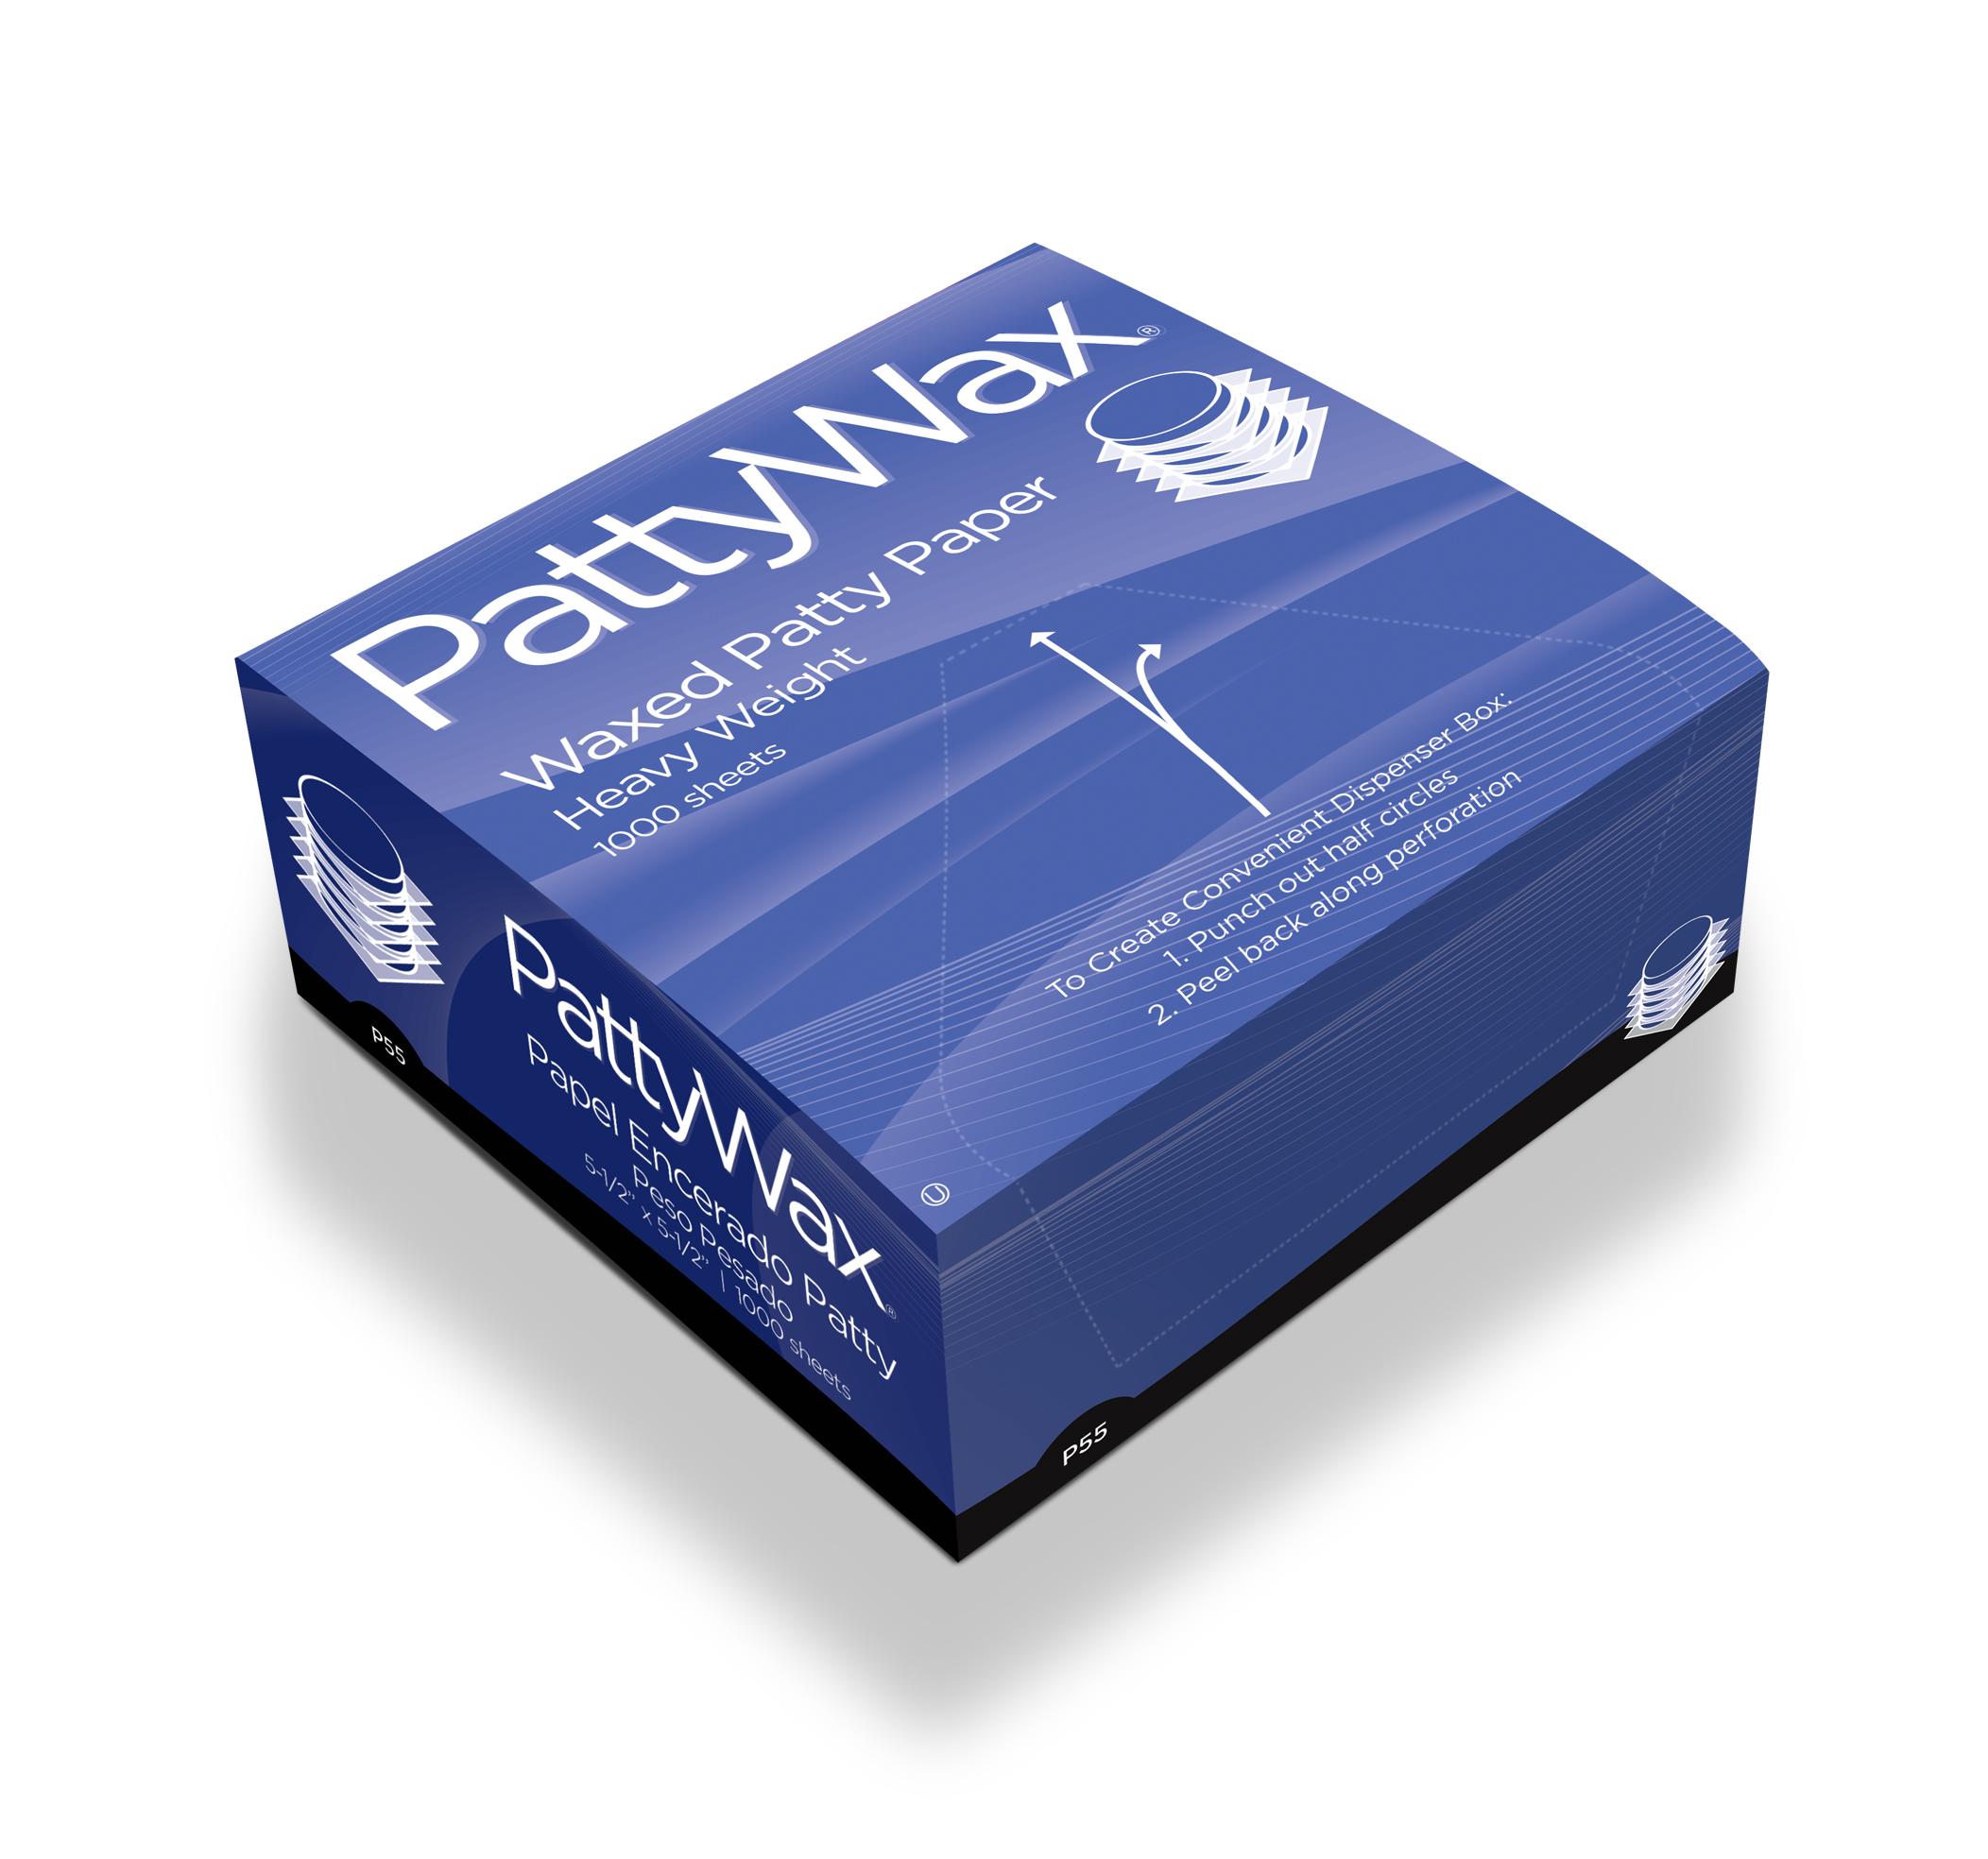 Box of 1000 Sheets Heavy Weight Hamburger Patty Paper